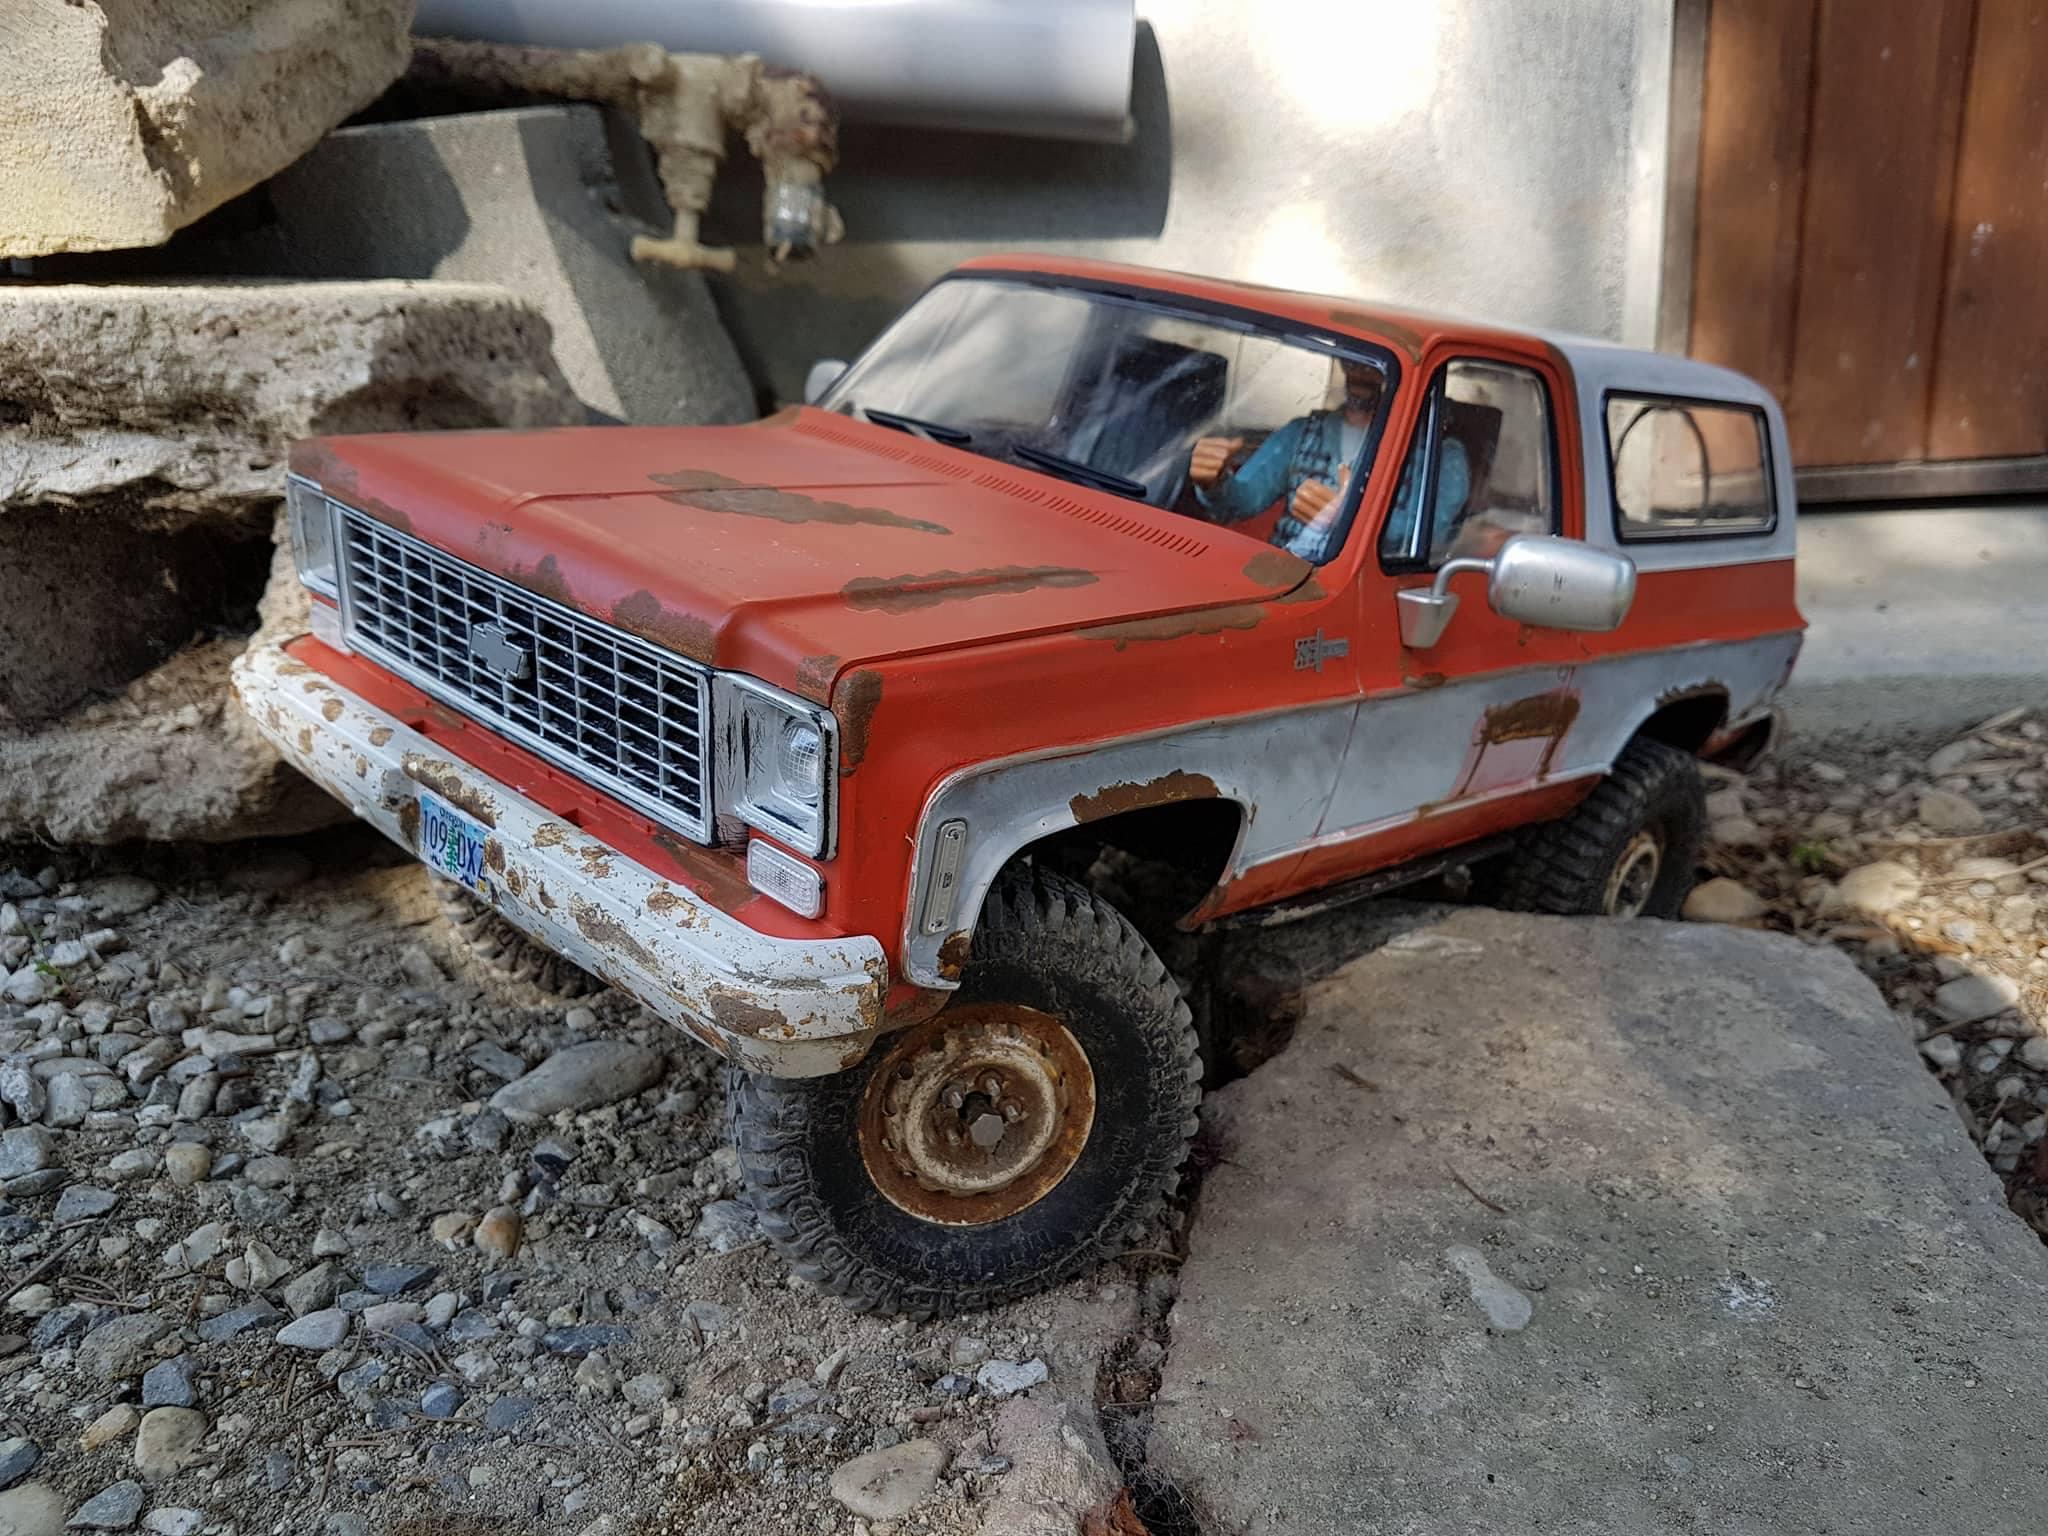 Farm Truck Chevrolet Blazer K5 sur TF2, Road Trip ! - Page 2 1496170538-18789979-1284018188383388-525193208-o